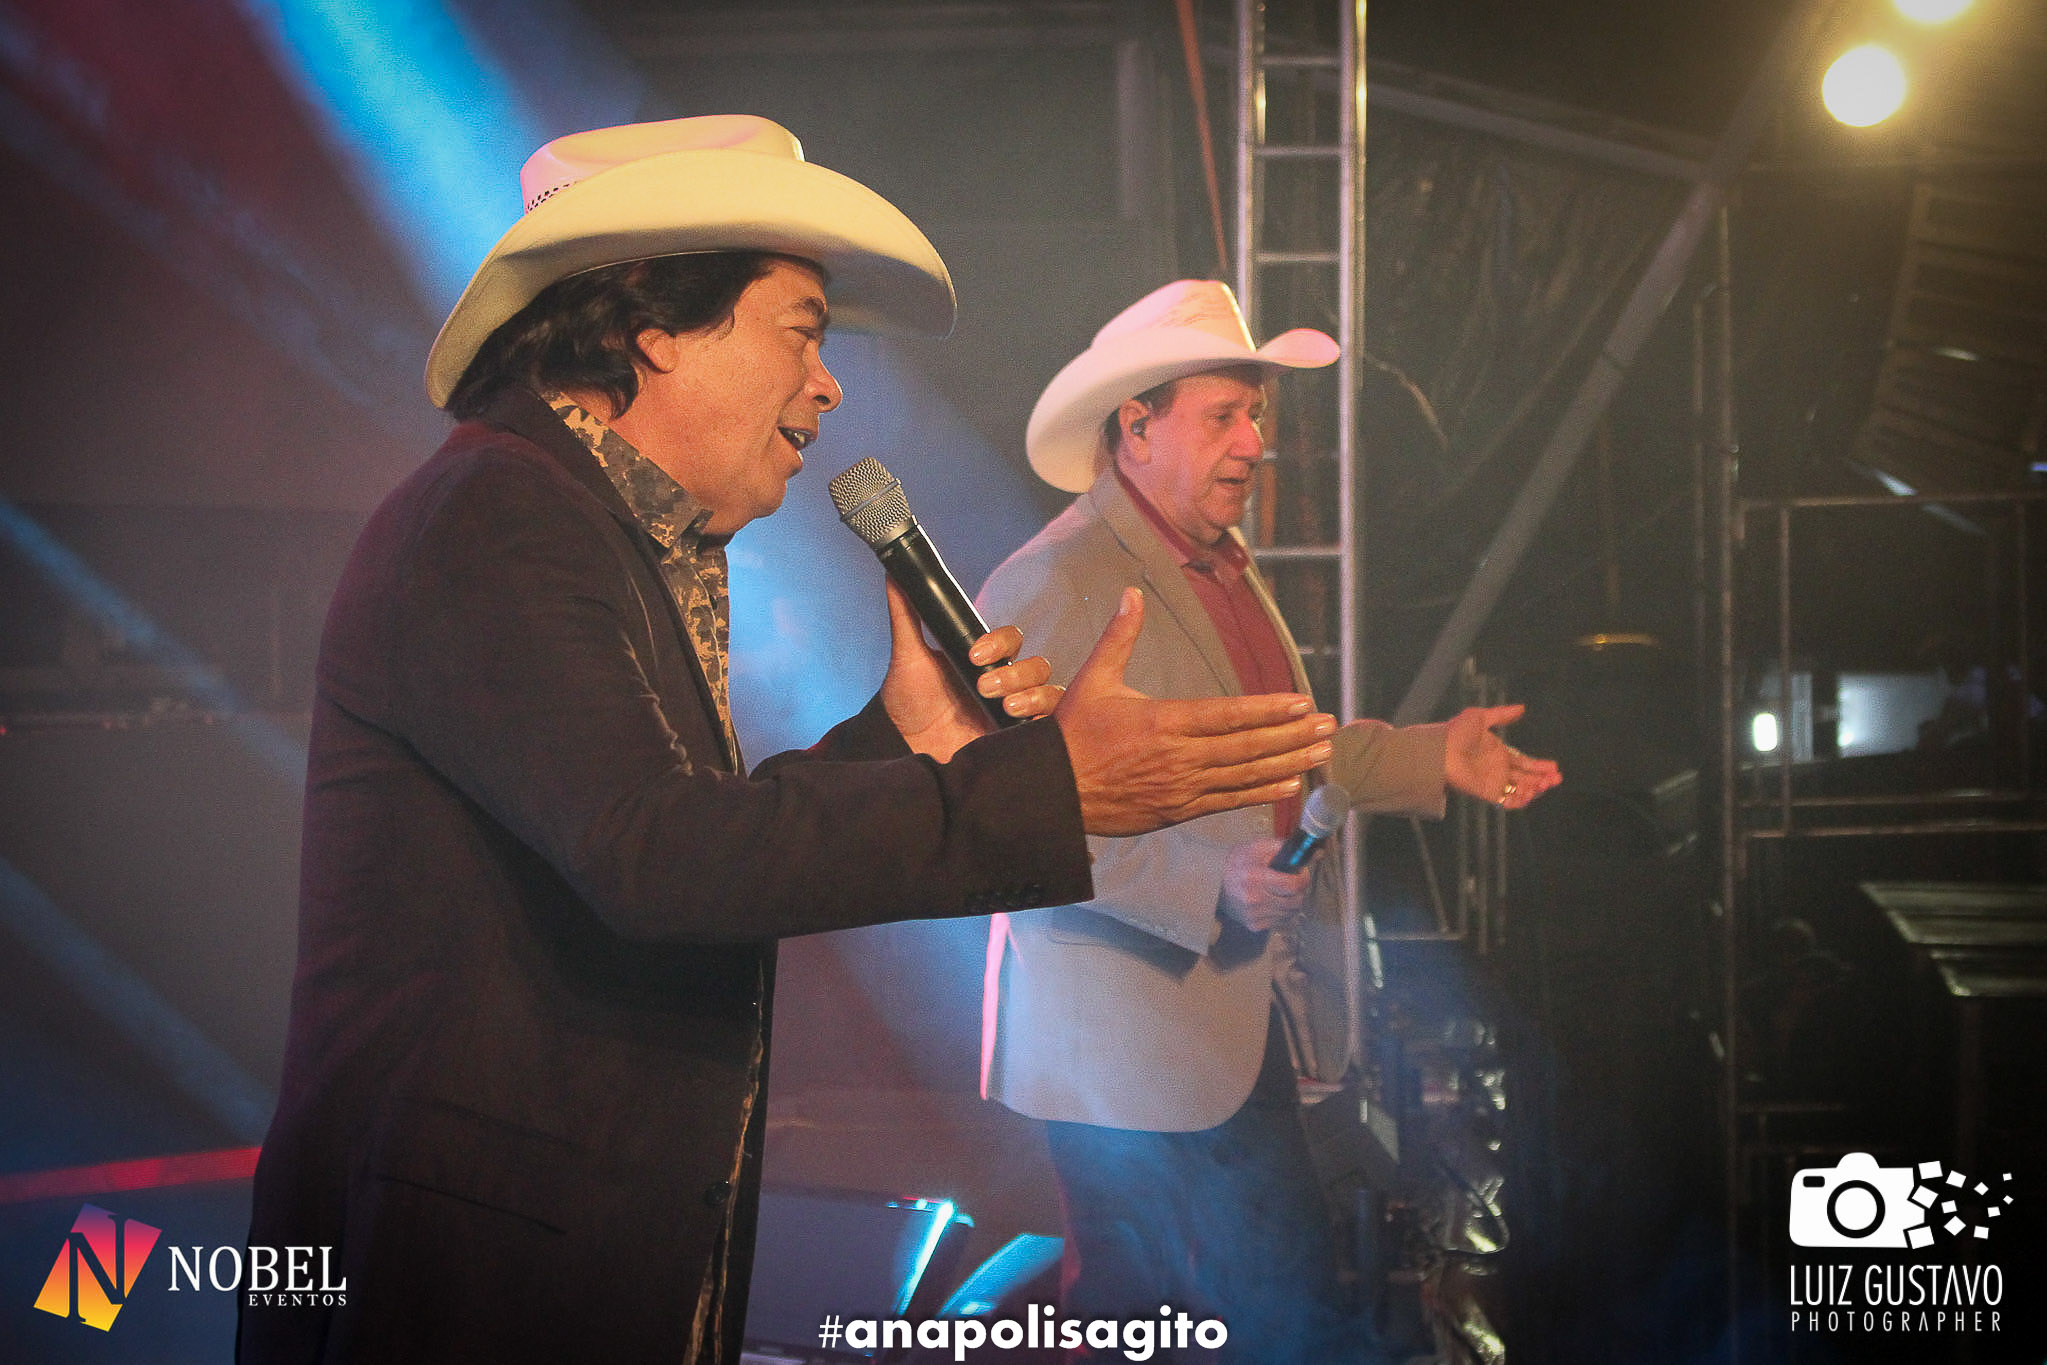 Luiz Gustavo Photographer-220